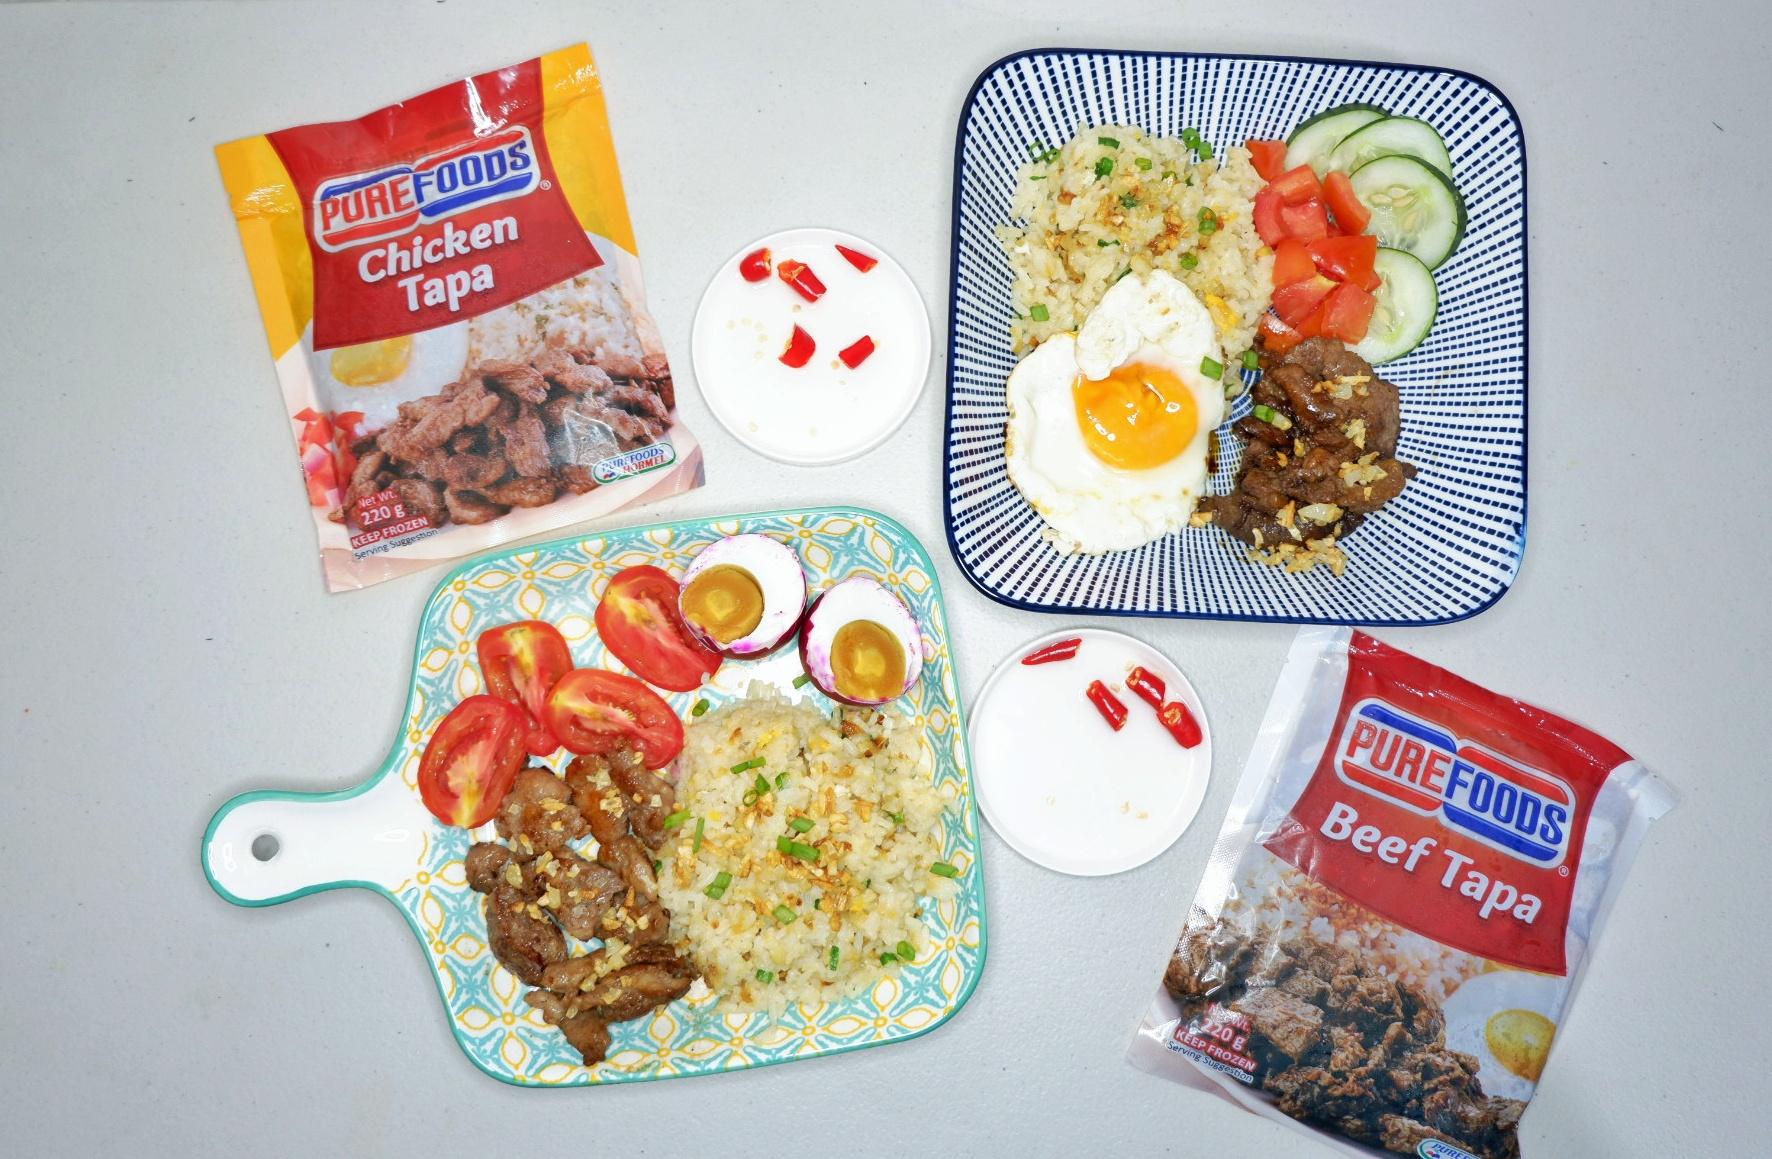 purefoods tapa 5